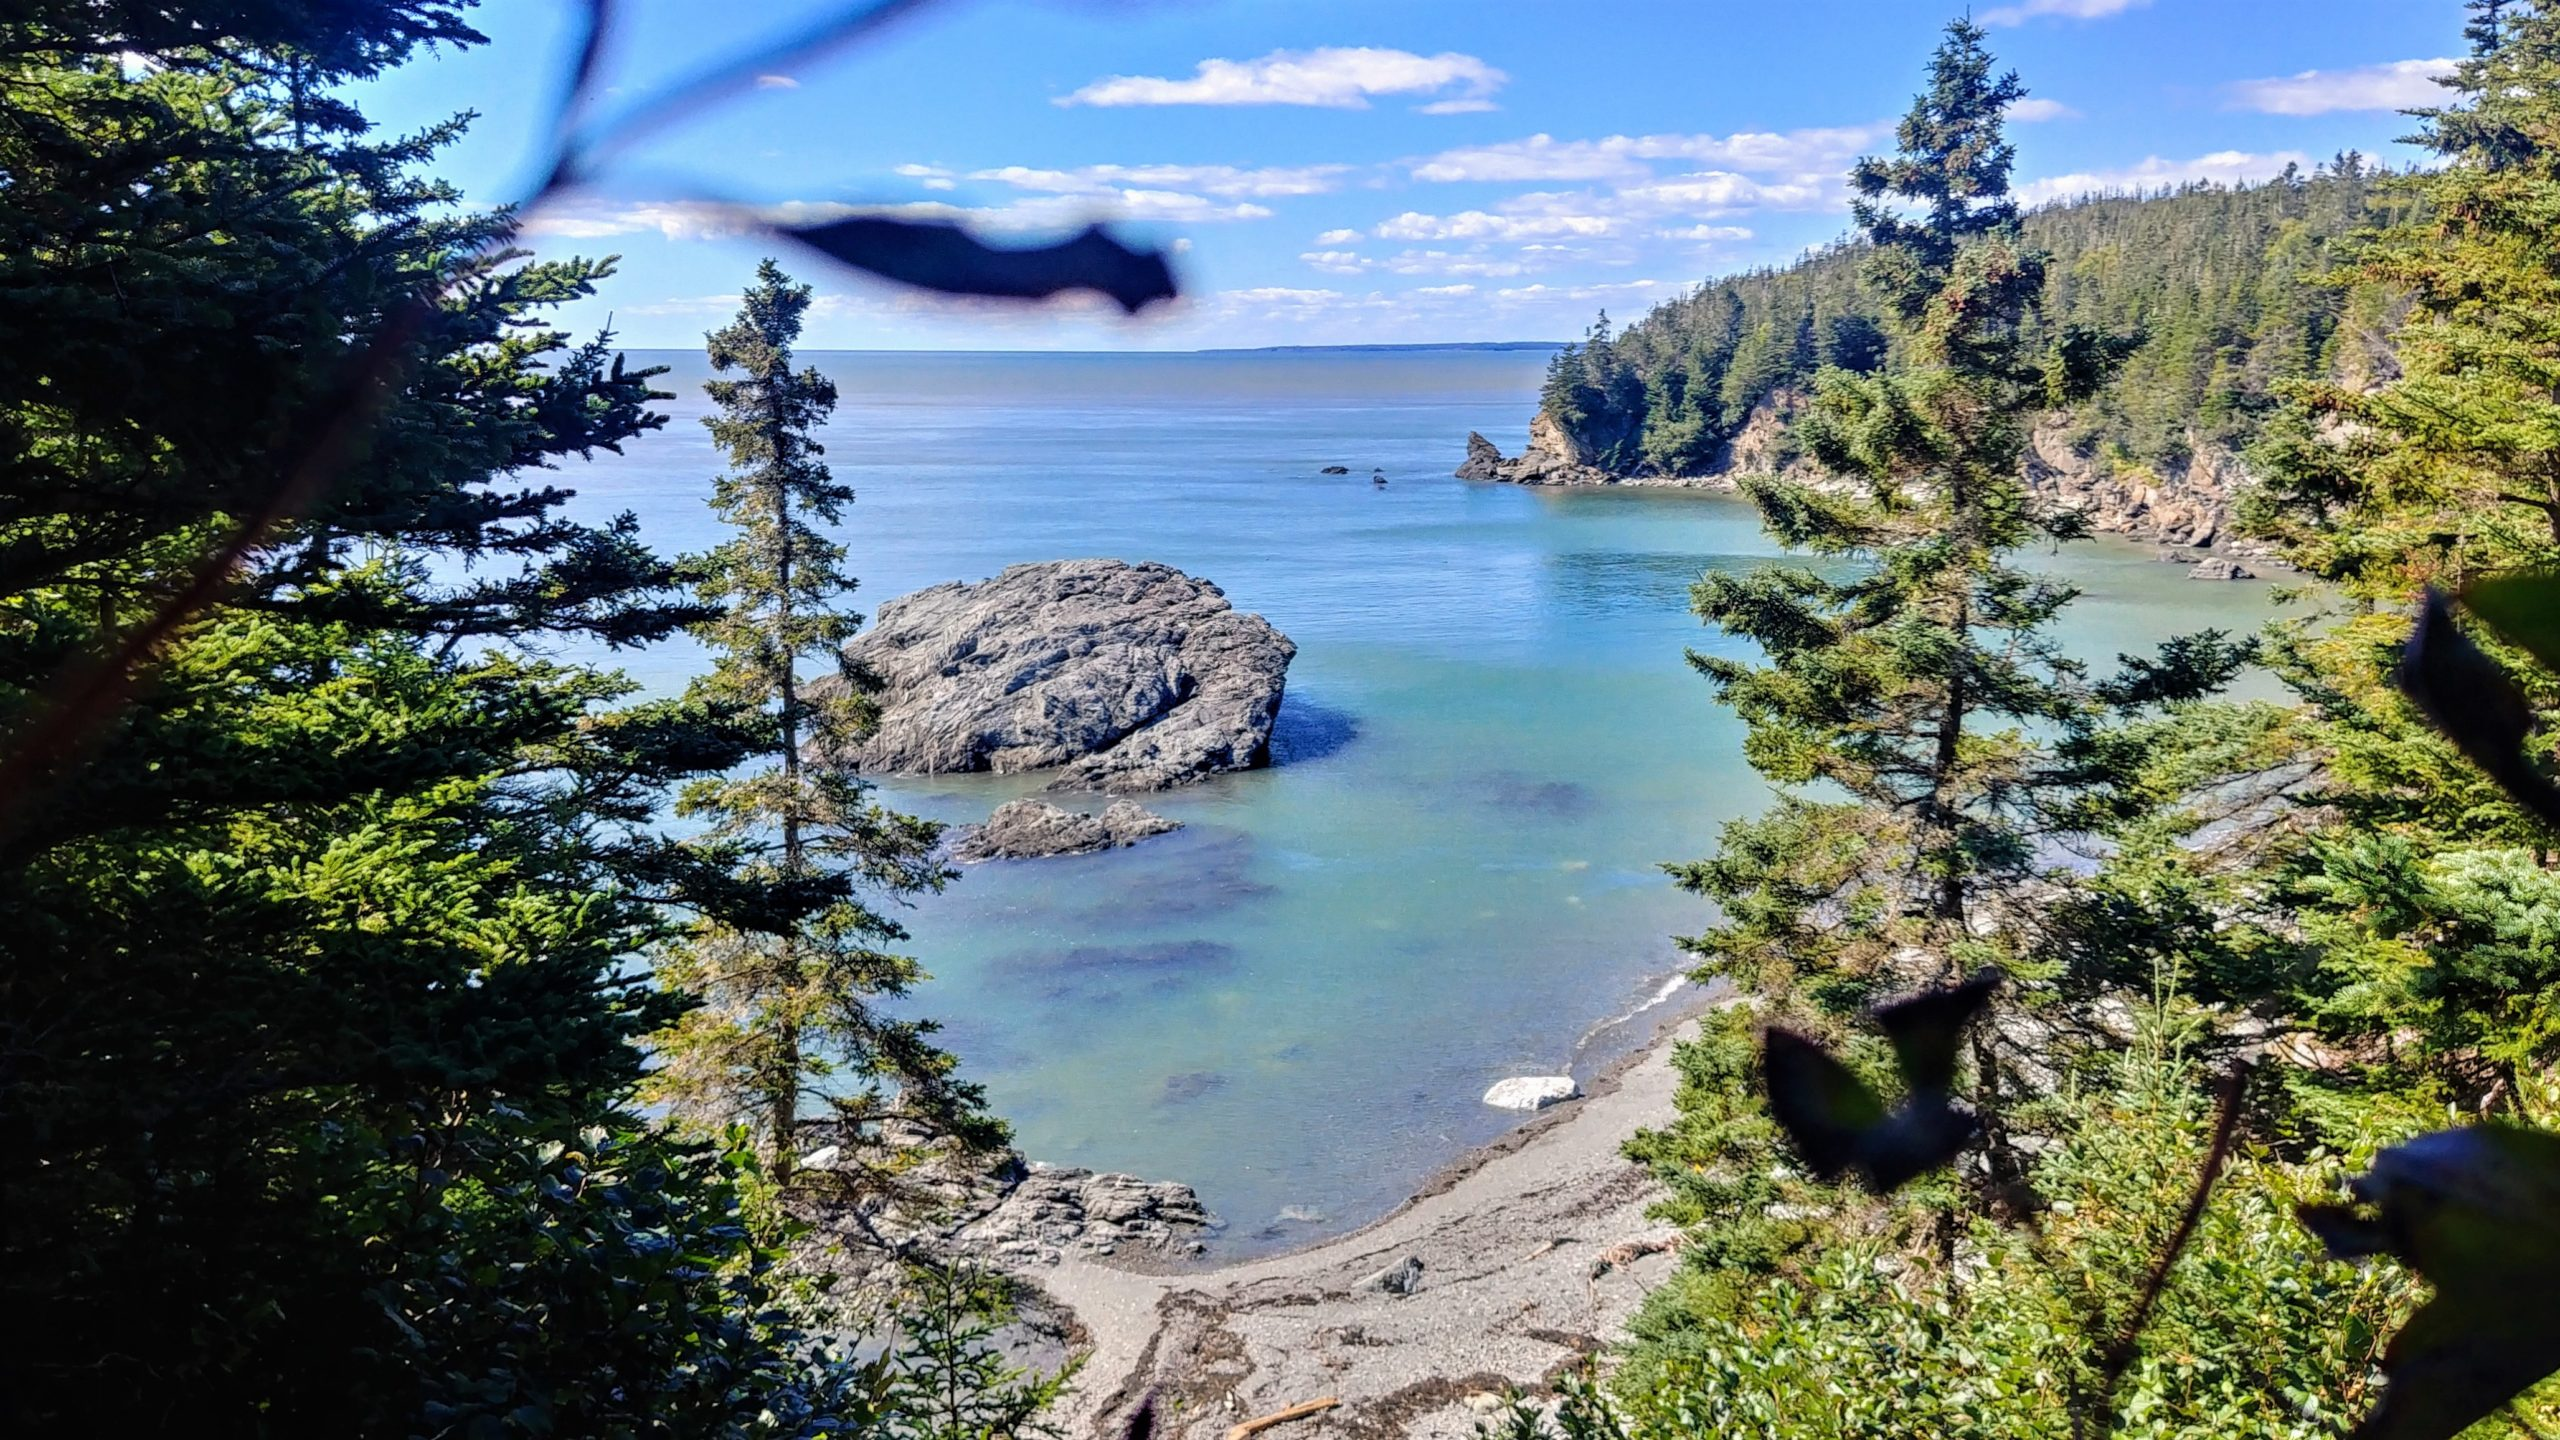 Split Rock Trail randonnée facile Nouveau-Brunswick Fundy Canada Arpenter le chemin